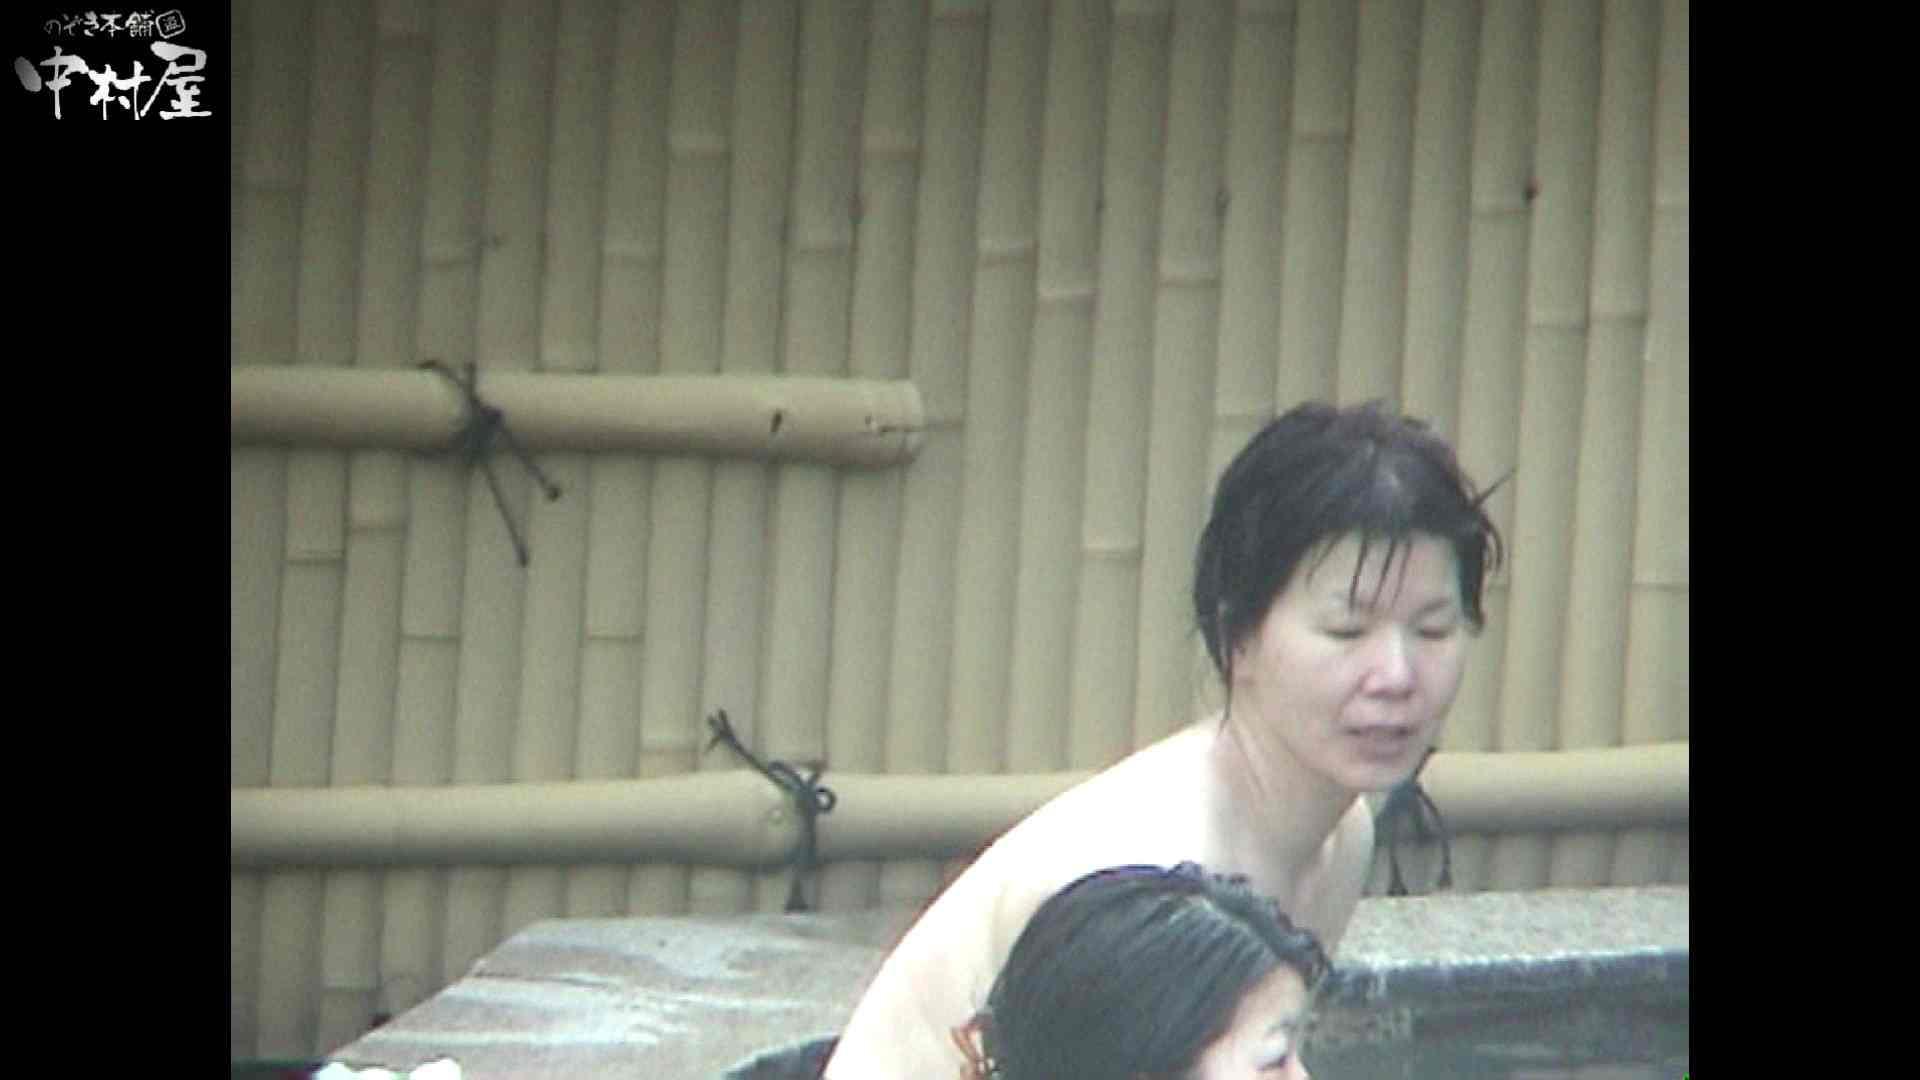 Aquaな露天風呂Vol.936 綺麗なOLたち  78枚 36